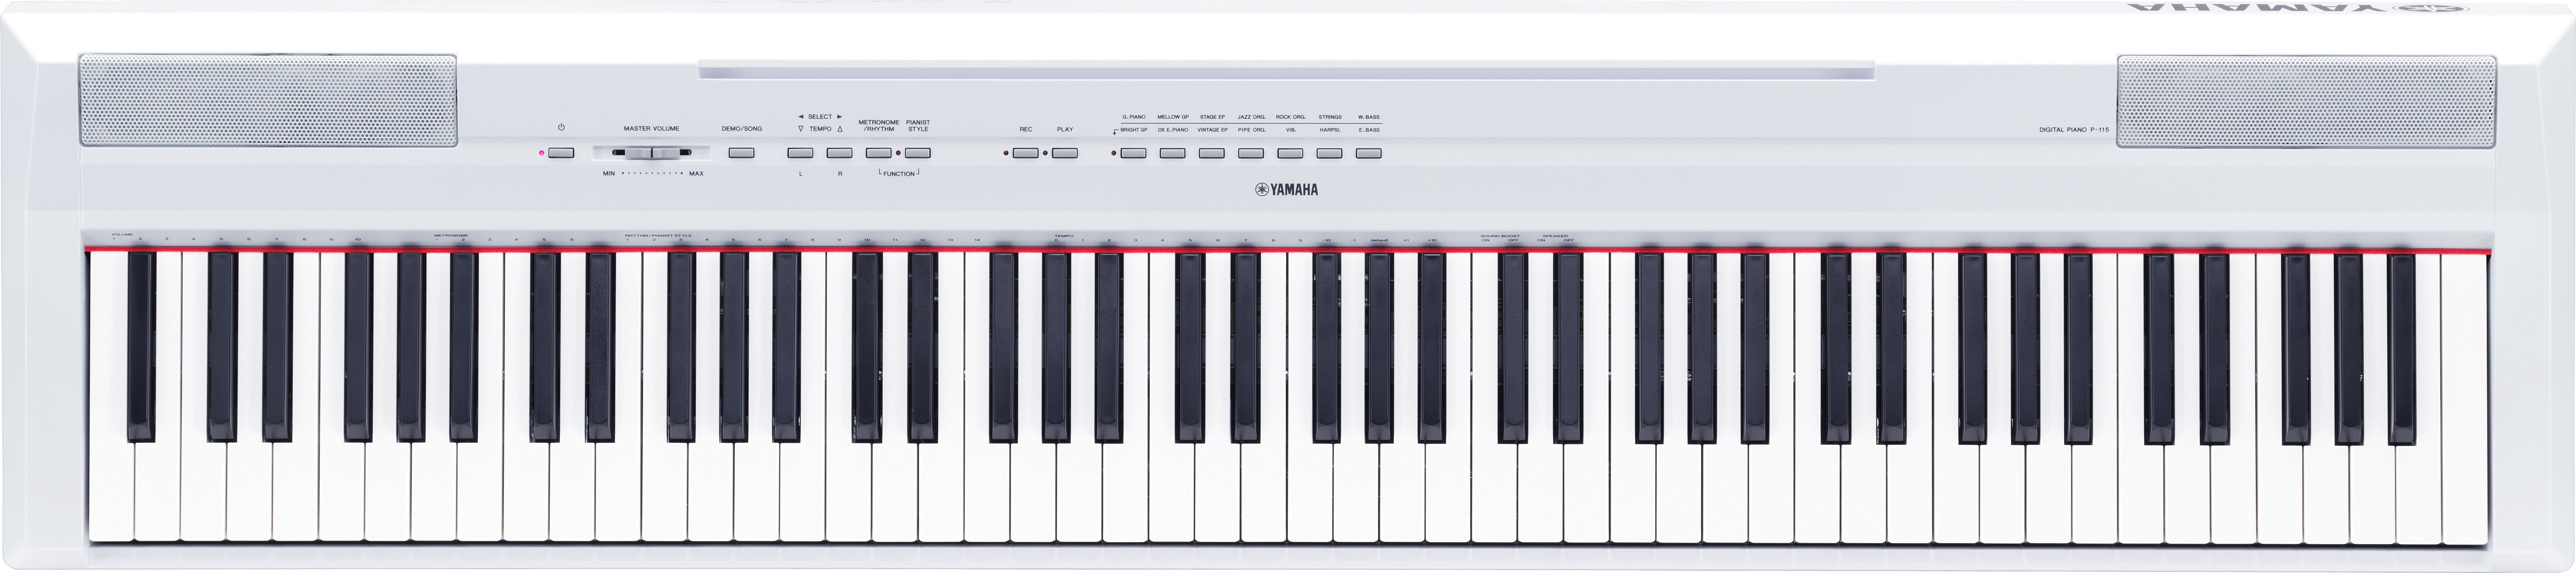 Yamaha Master Piano Compatible With Ableton